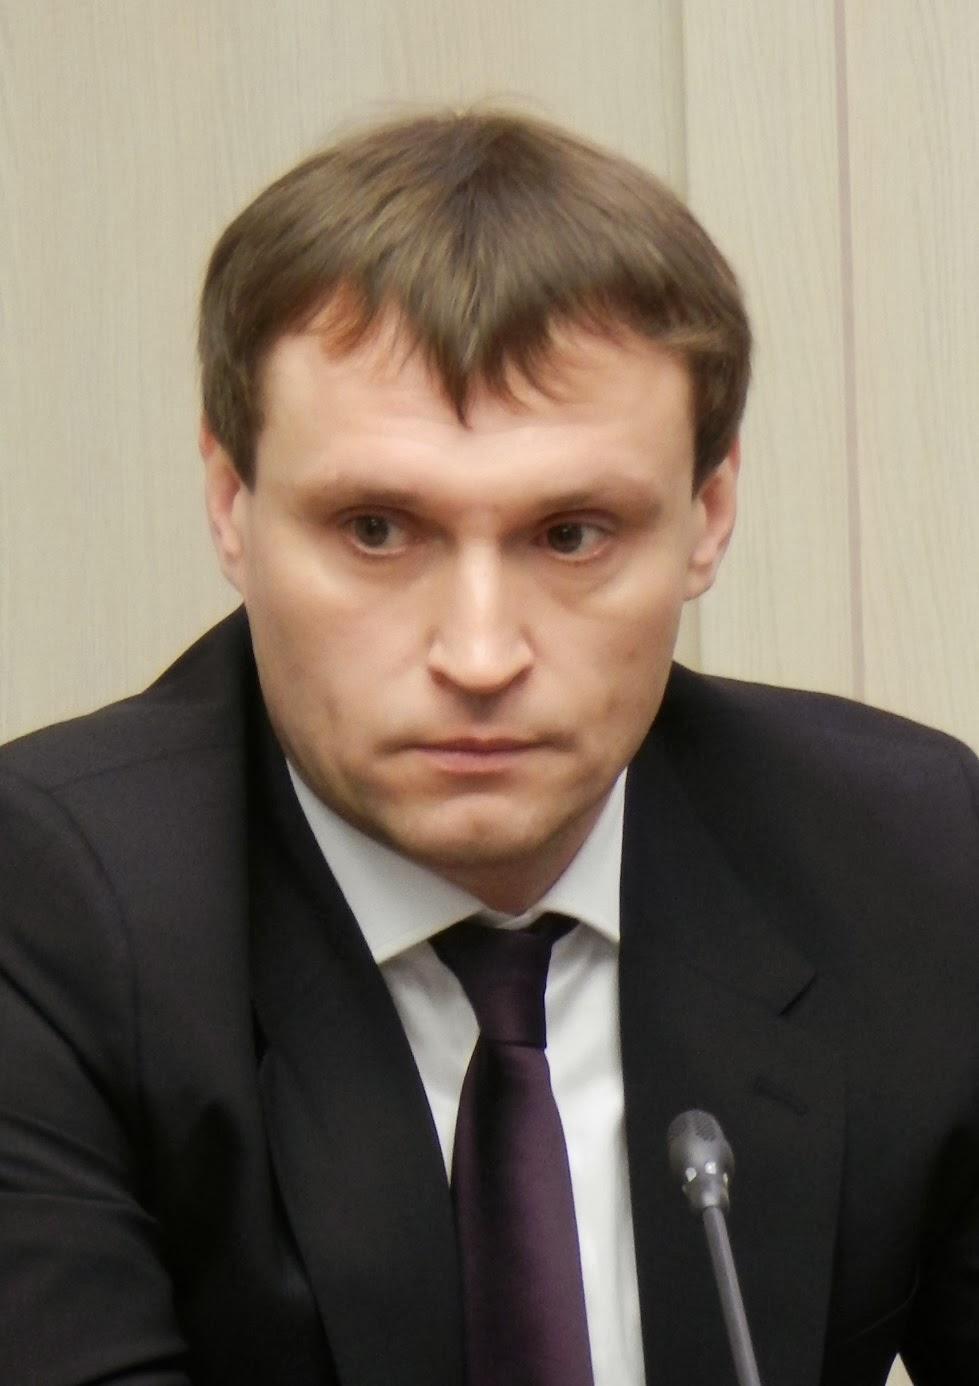 У Сергея Пахомова накопились претензии к законам Сергиев Посад